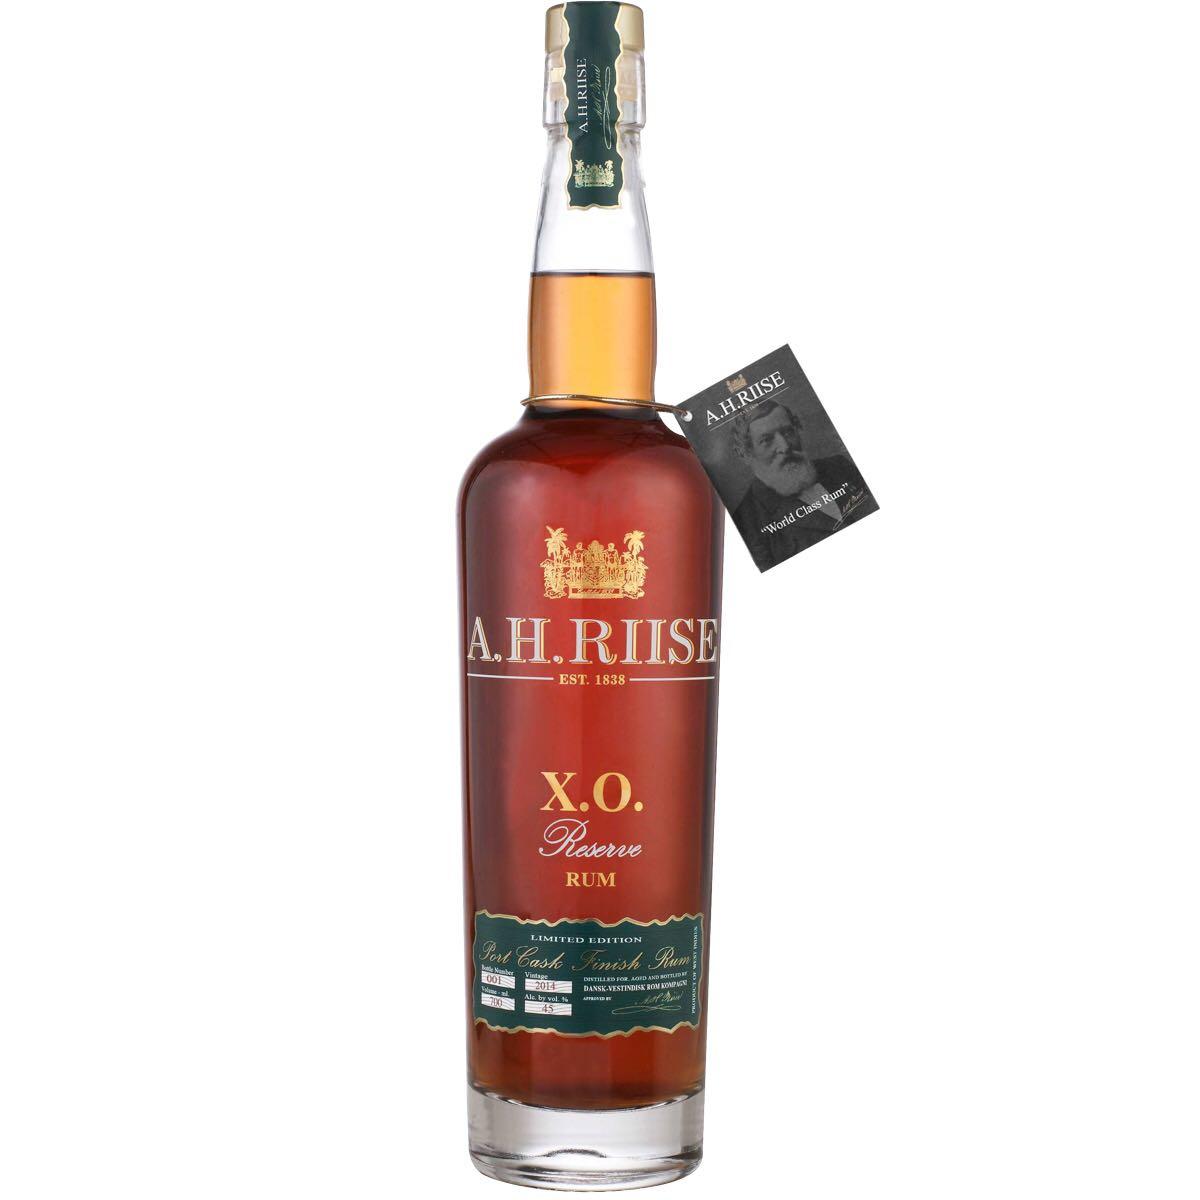 Bottle image of XO Reserve Rum Port Cask